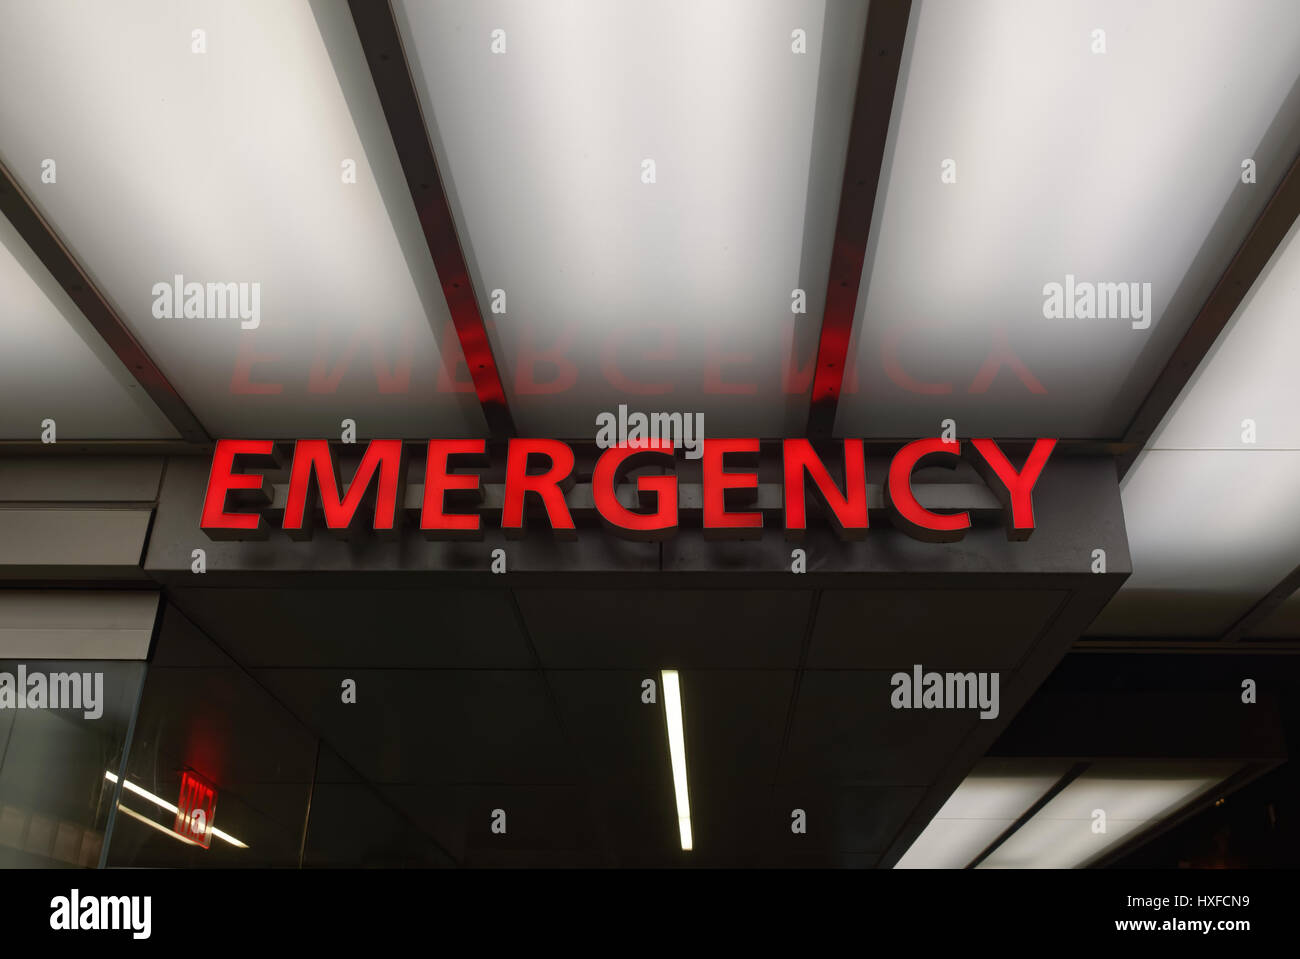 emergency-room-neon-sign-HXFCN9.jpg